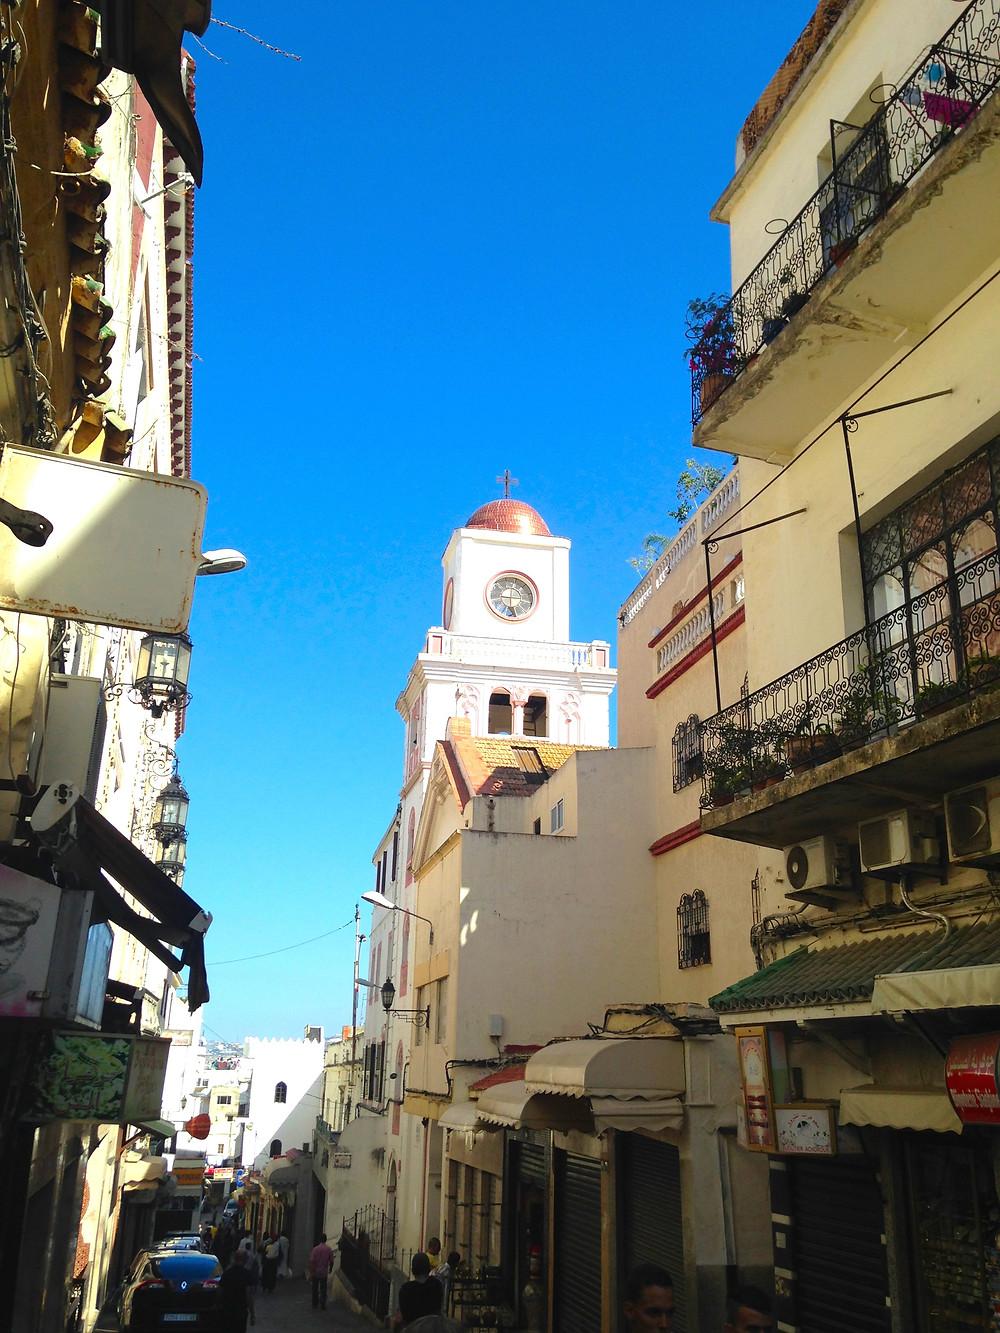 Church in the Medina Tangier Morocco